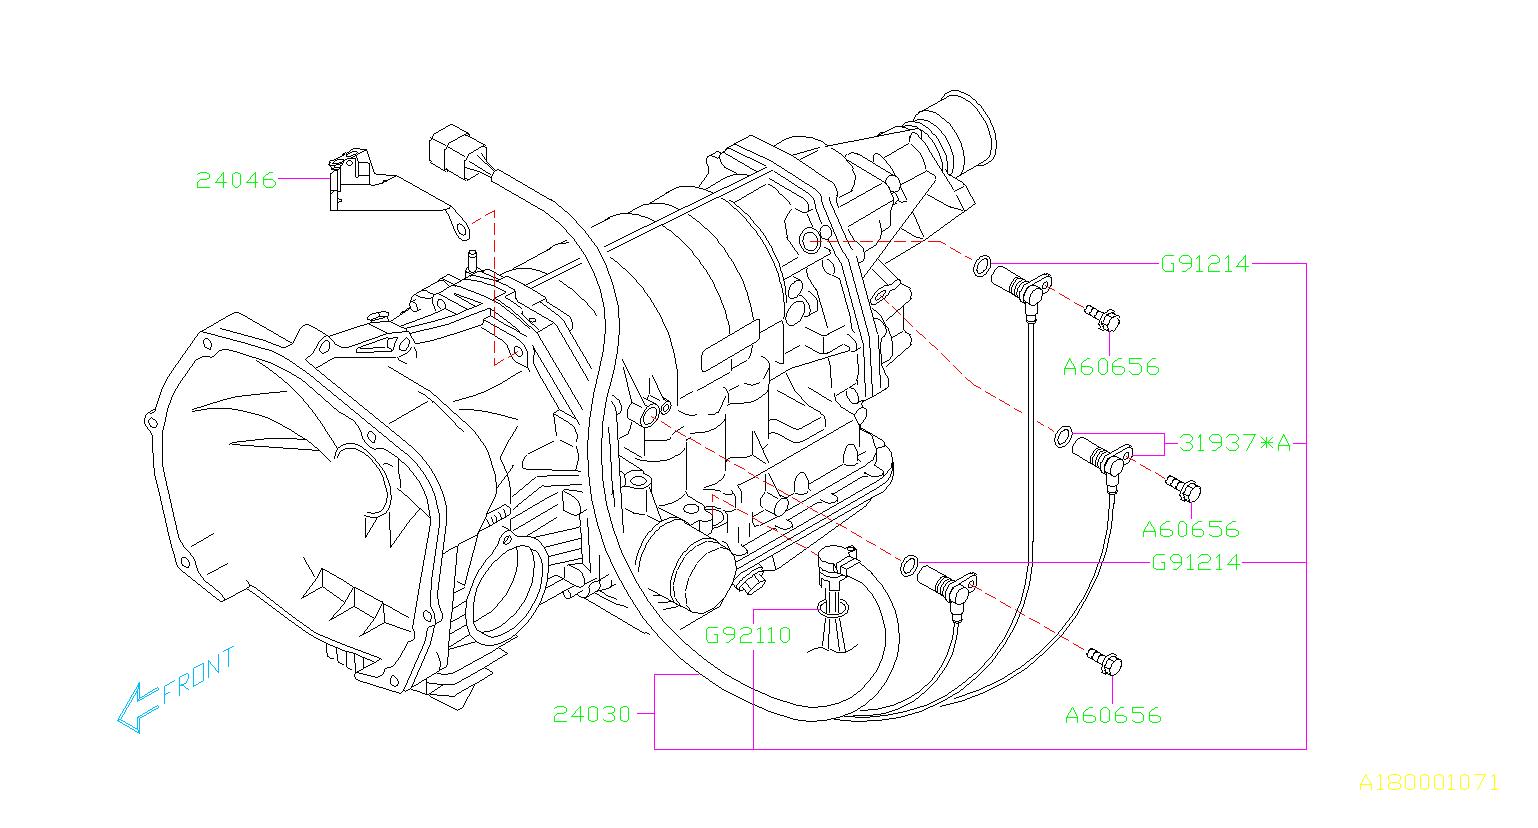 Subaru Outback Maf Sensor